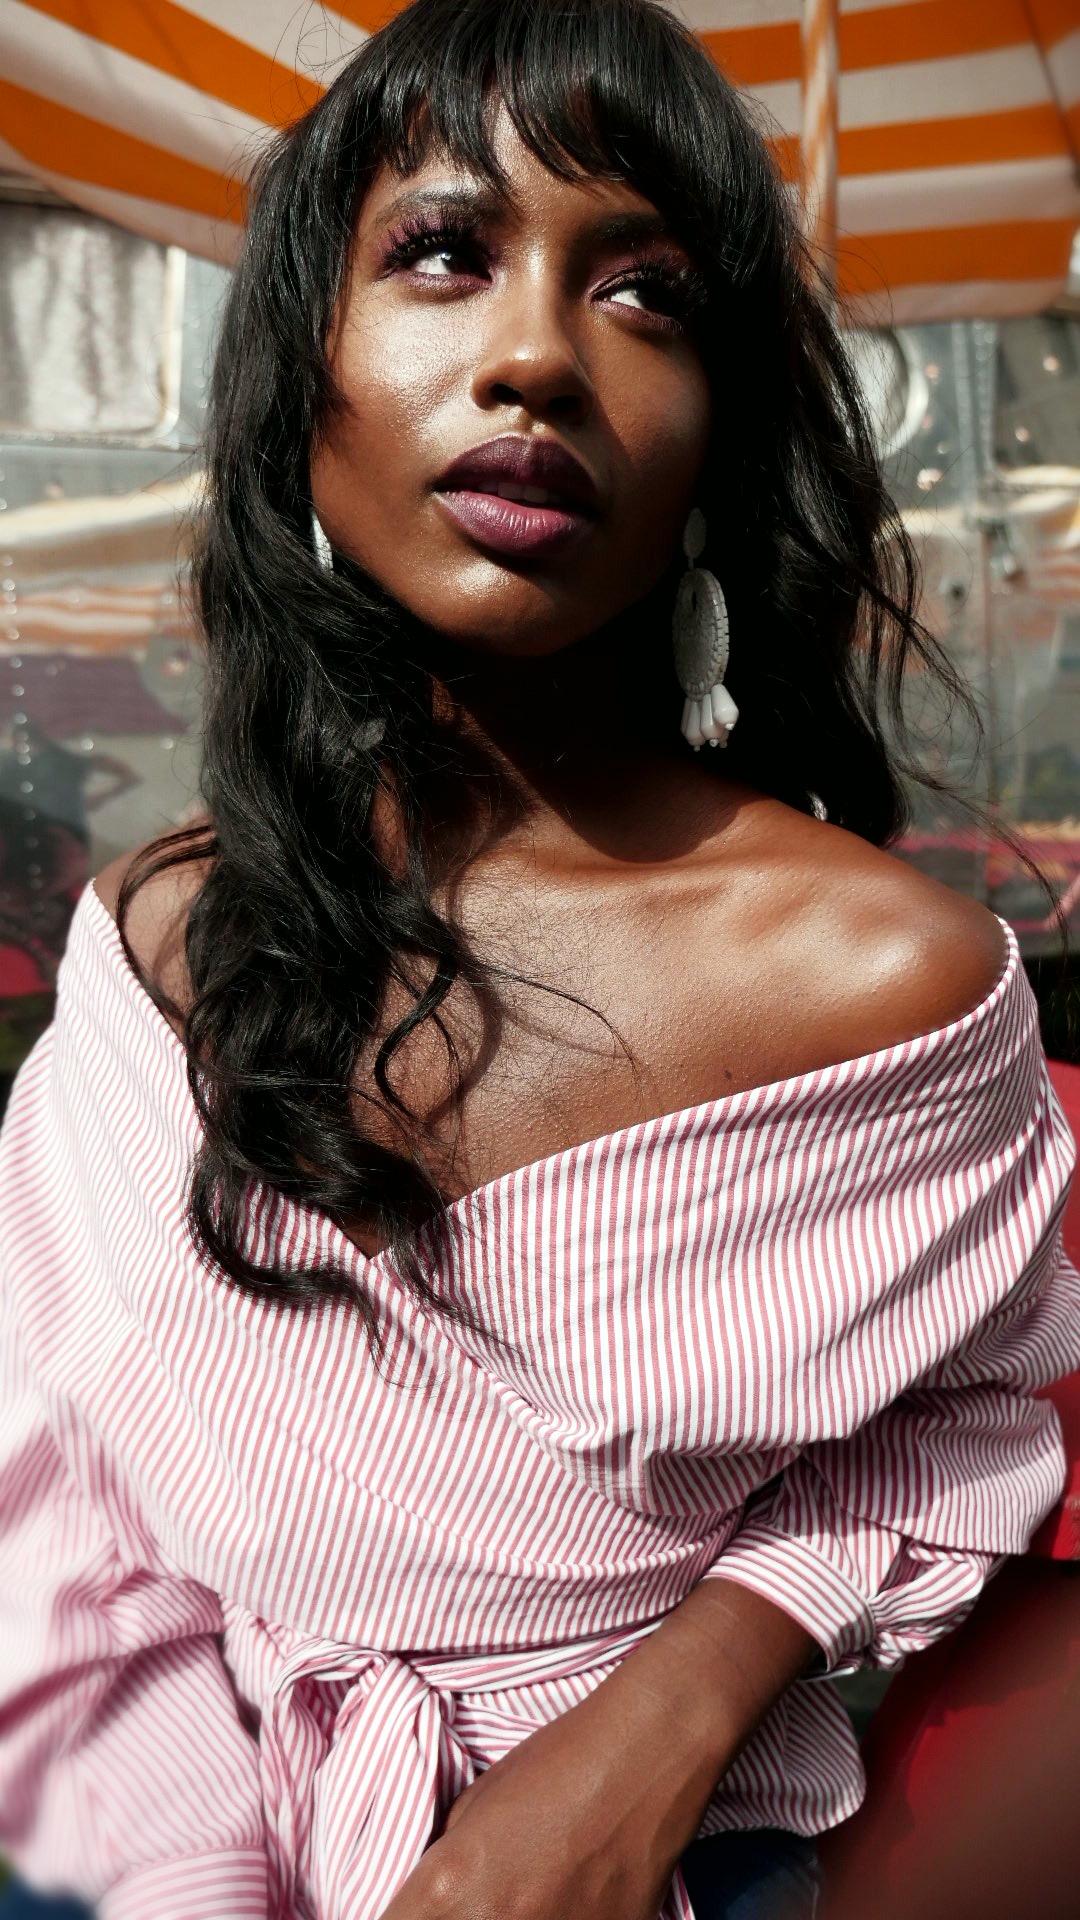 Make-up by: Grace Balsamo  https://www.gracebalsamo.com